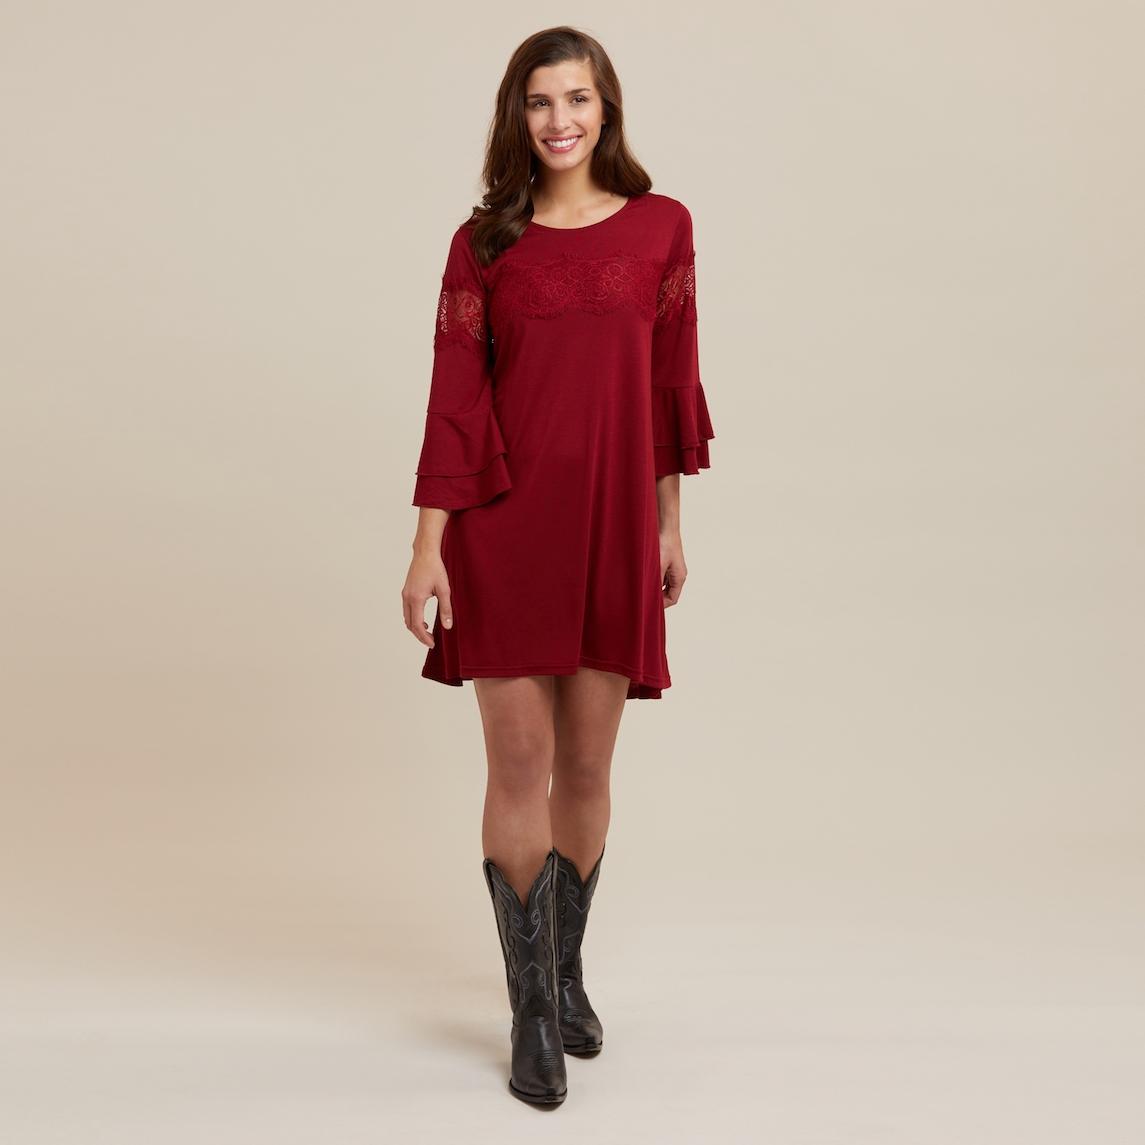 eaecaa3ee15e Wrangler® Wine Western Fashion Dress